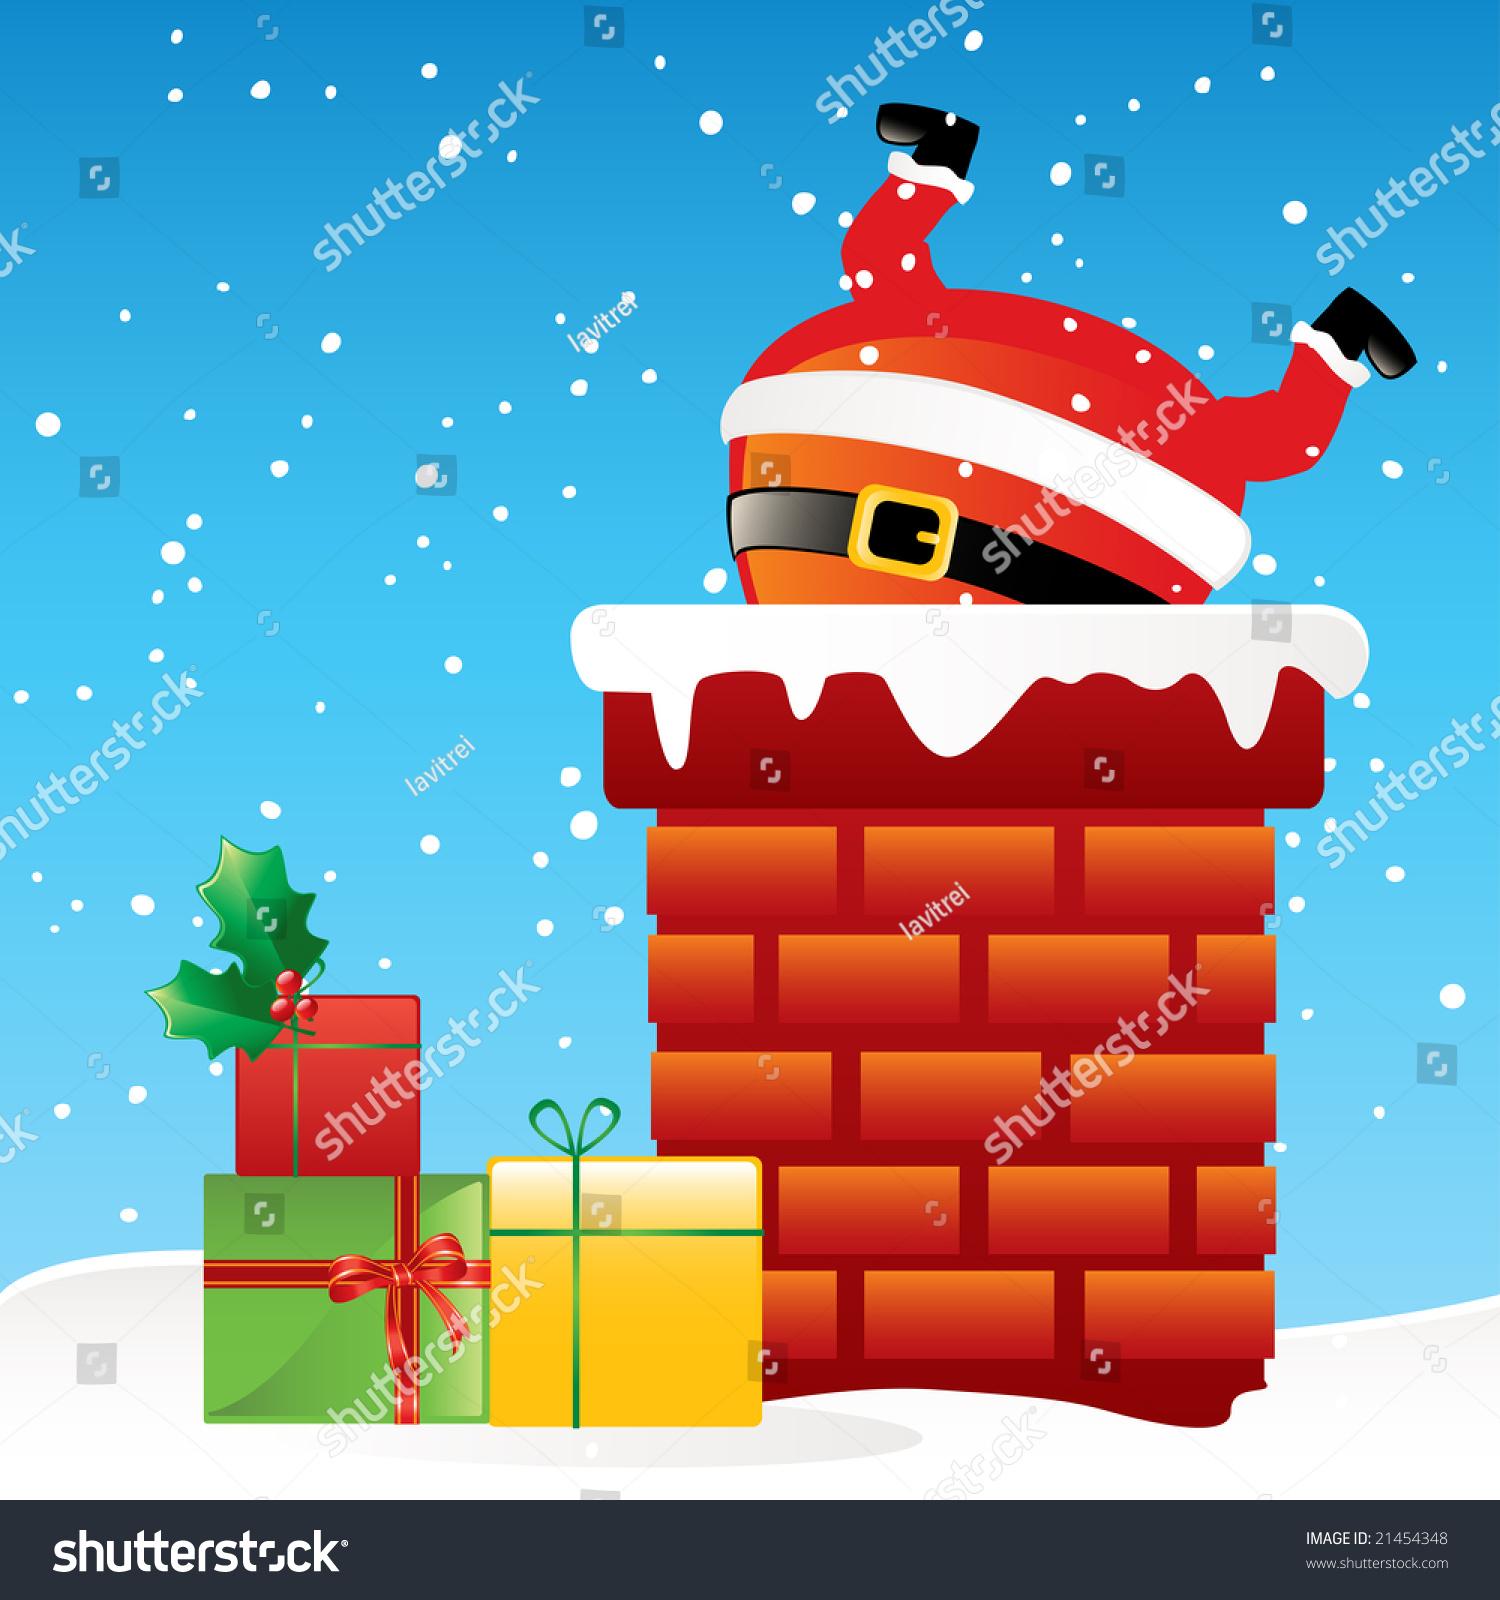 Funny Santa Claus Stuck Chimney On Stock Vector 21454348